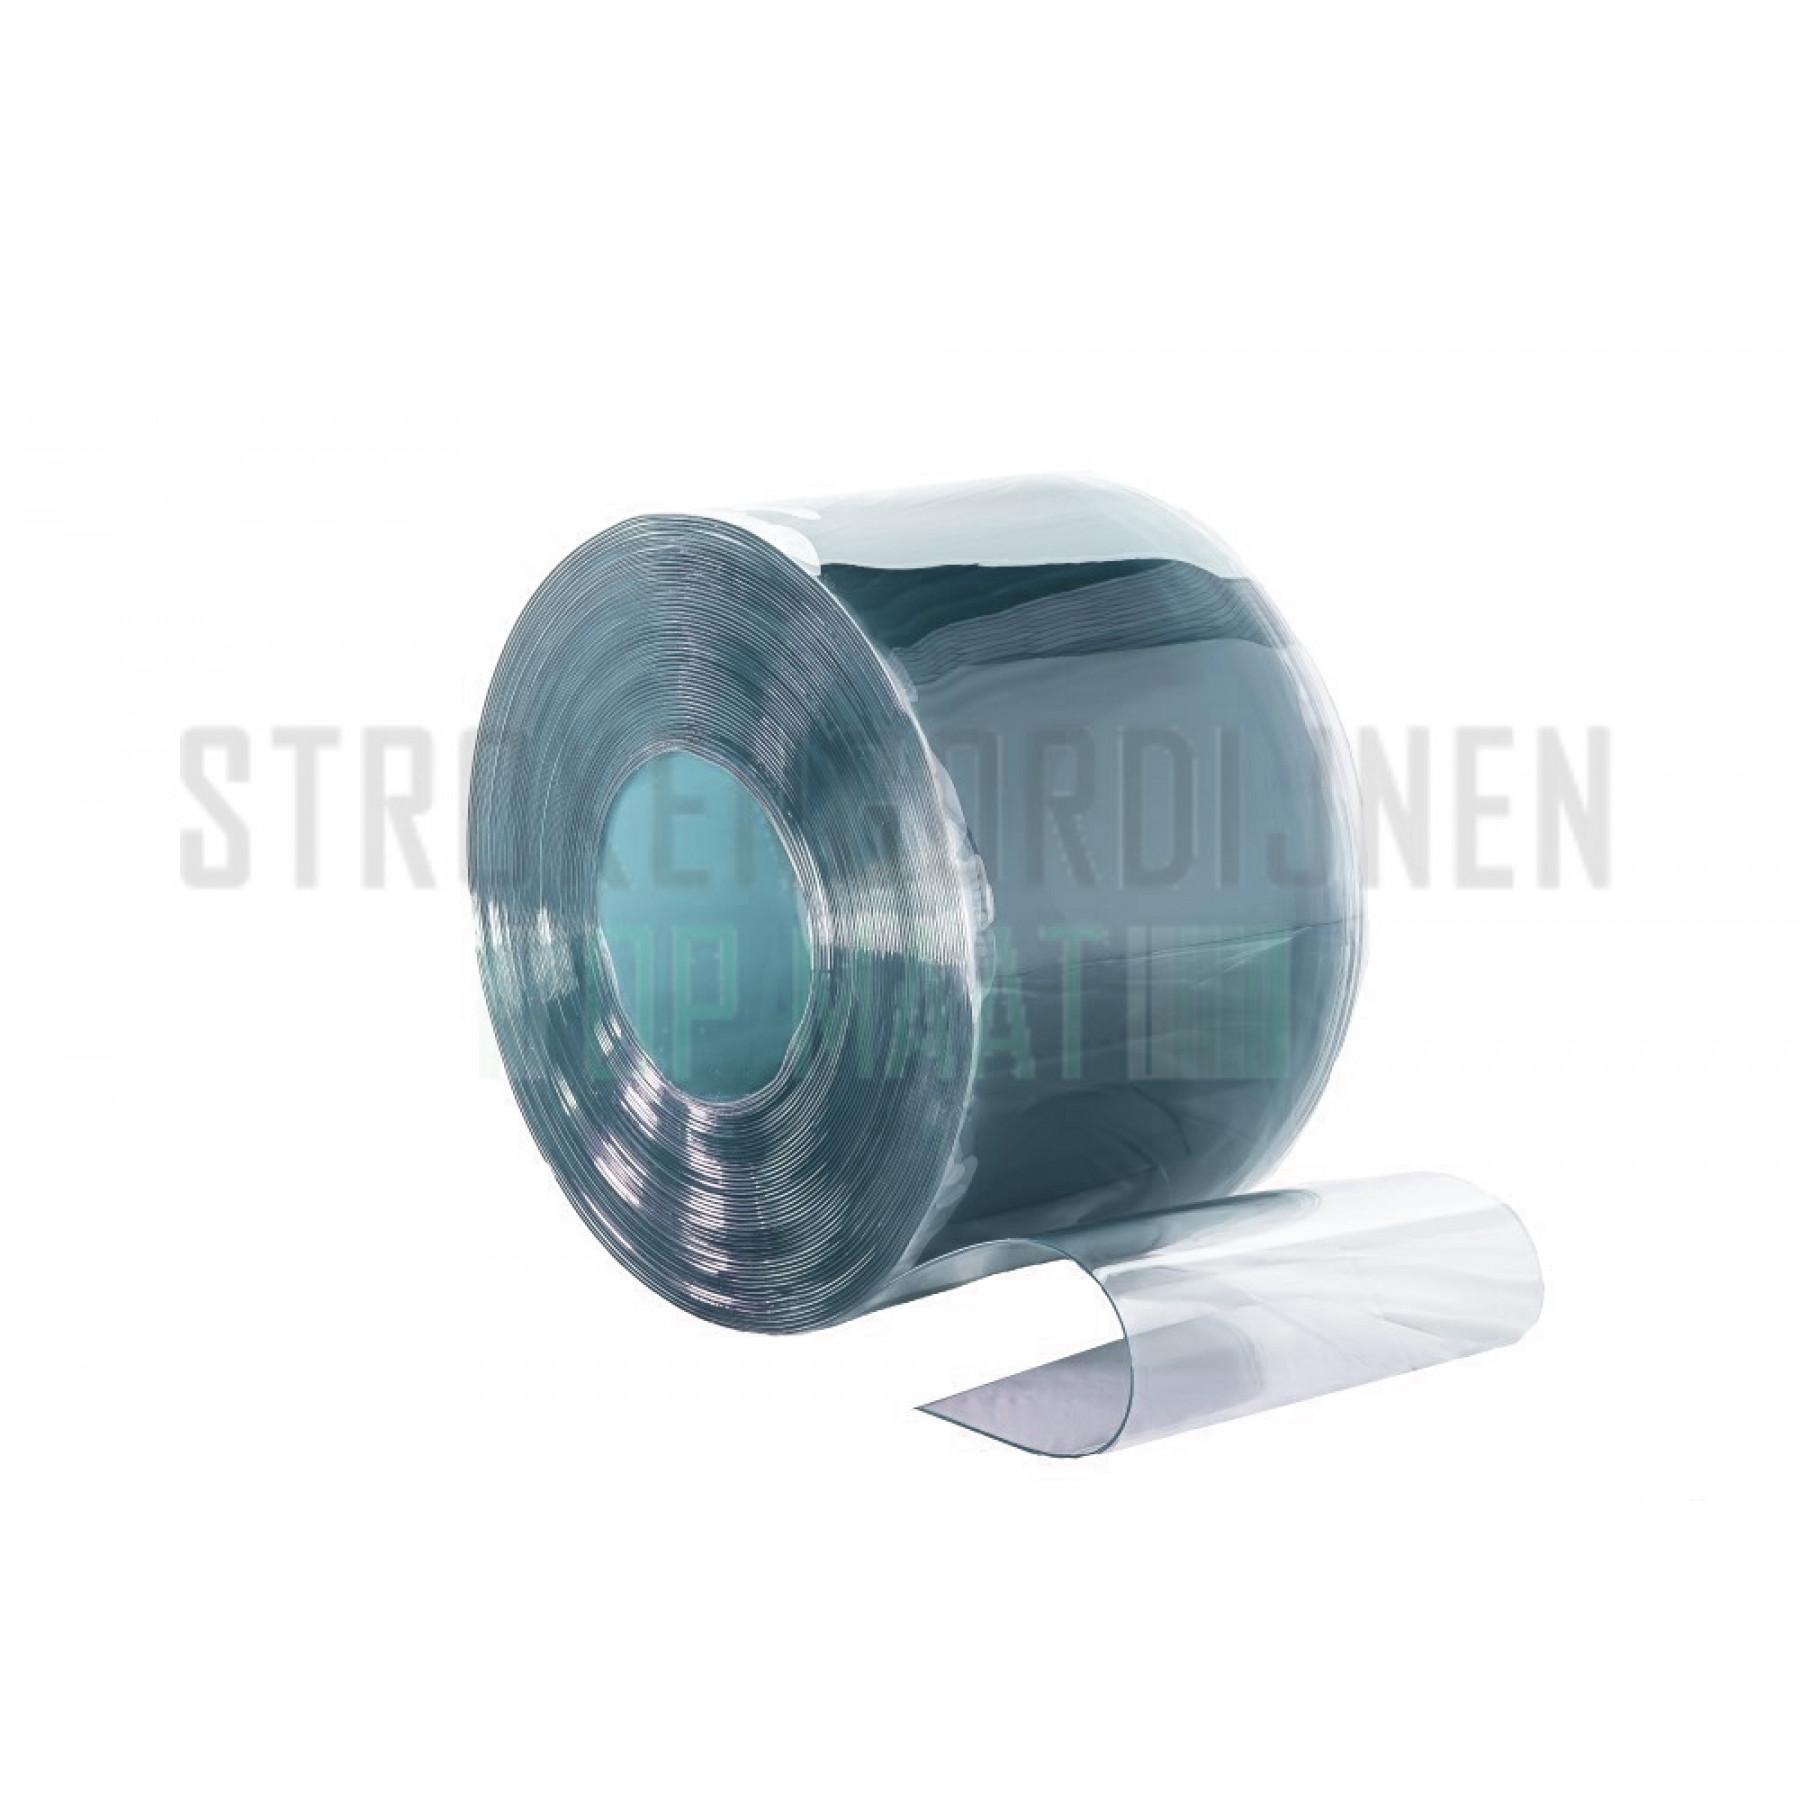 PVC Rolle, Brandschutz B1, 200mm breit, 2mm dick, 50 meter lang, transparent